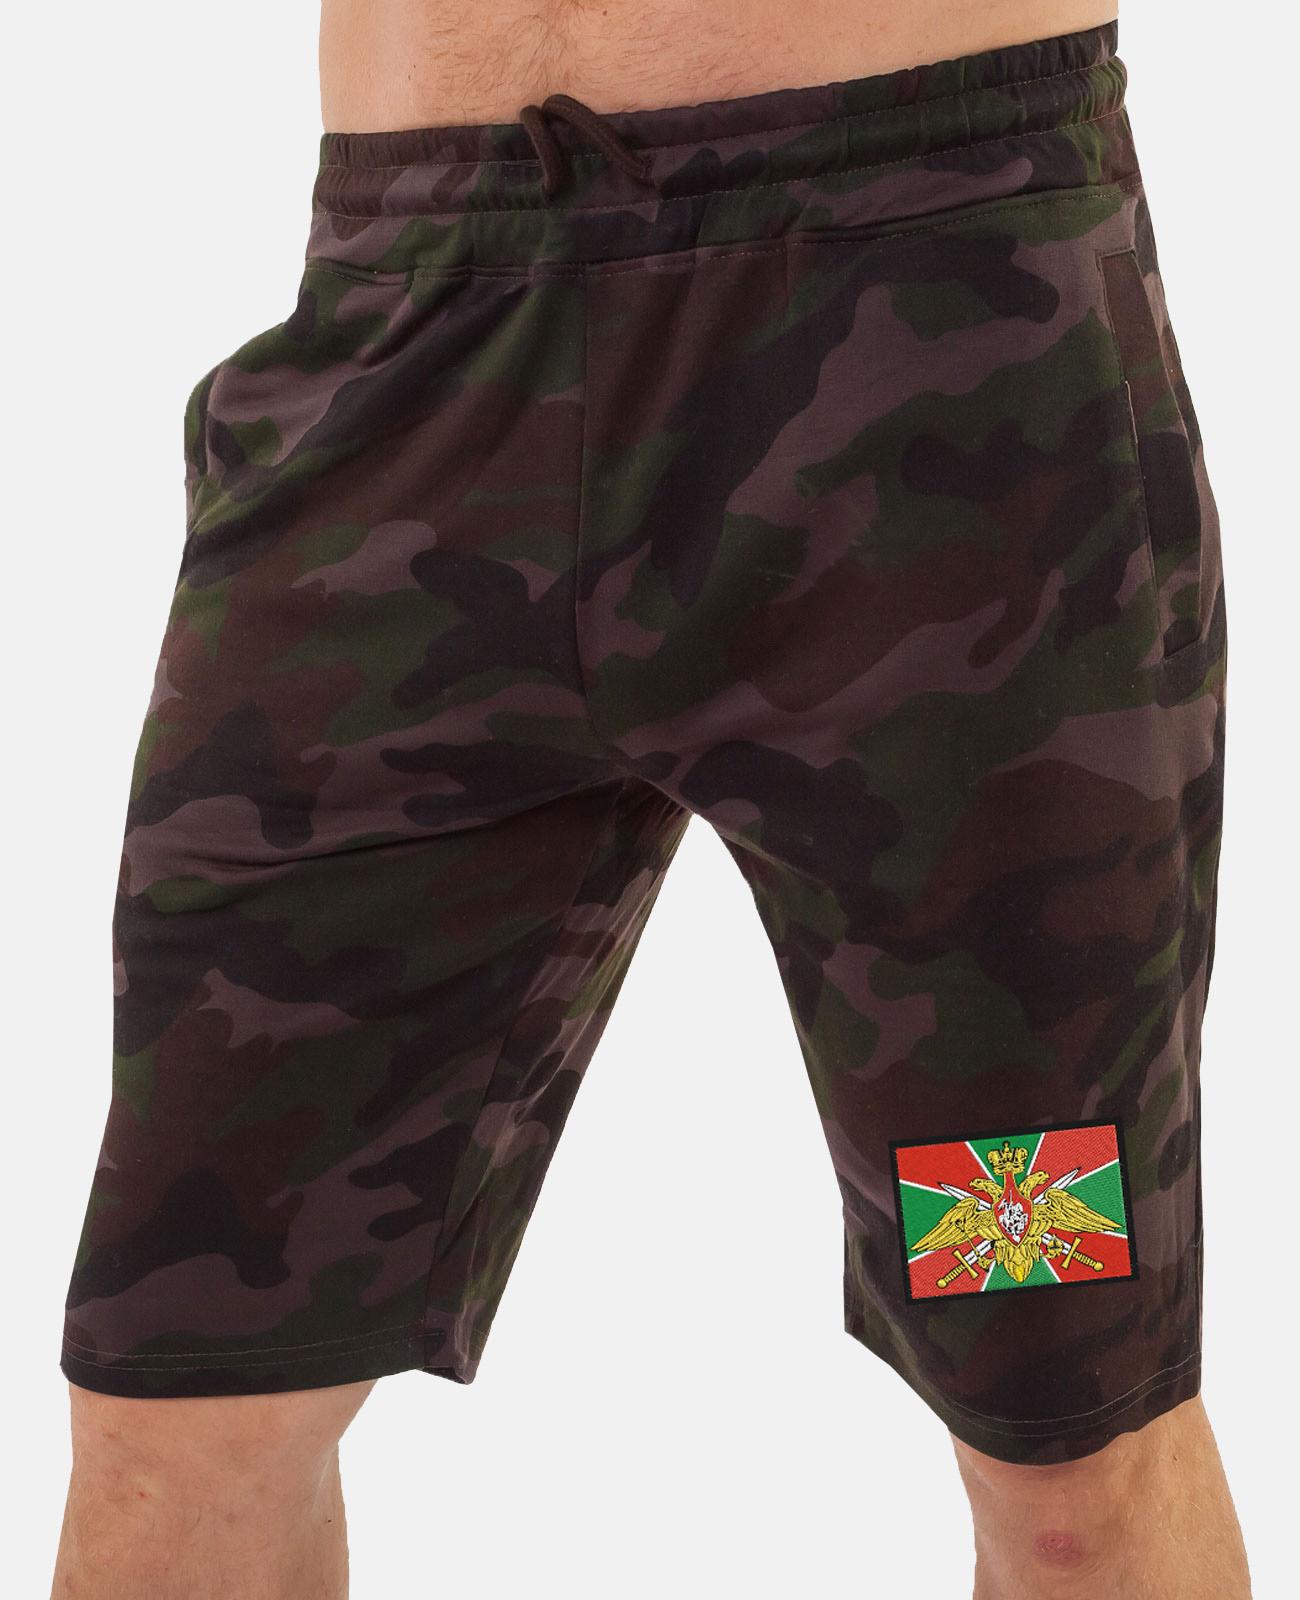 Армейские шорты камуфляж оптом